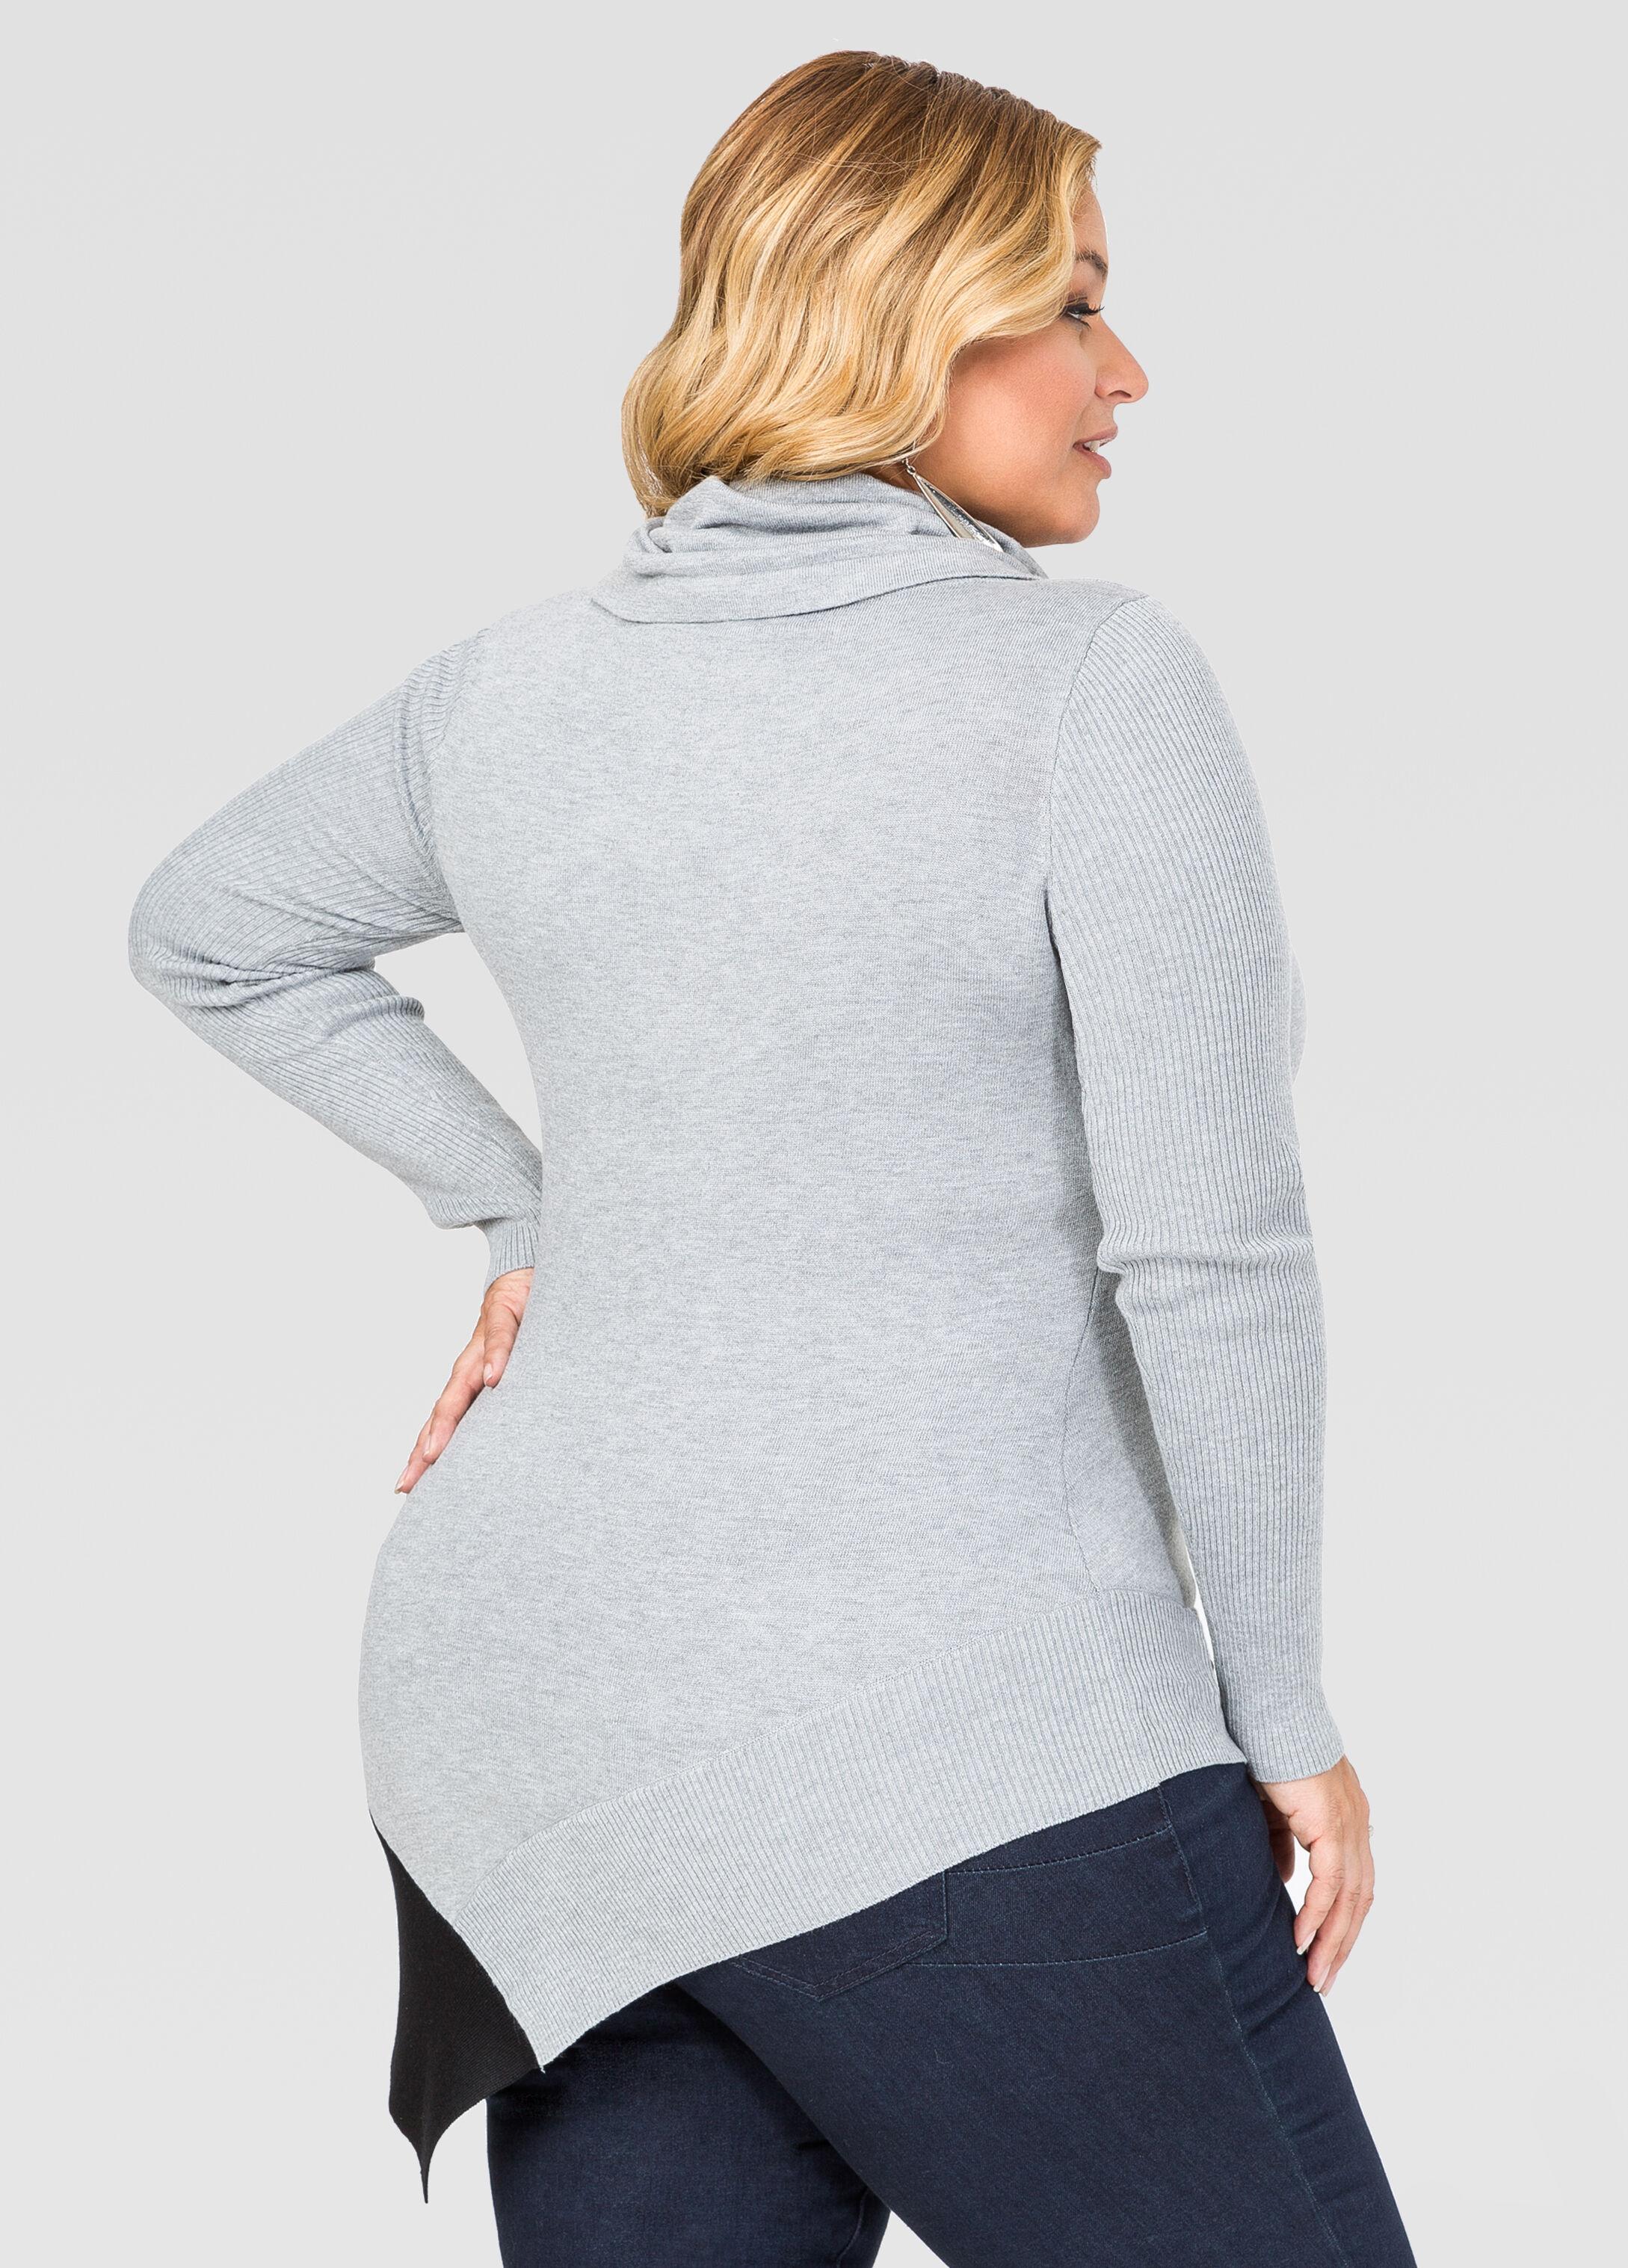 Asymmetrical Cowl Neck Sweater